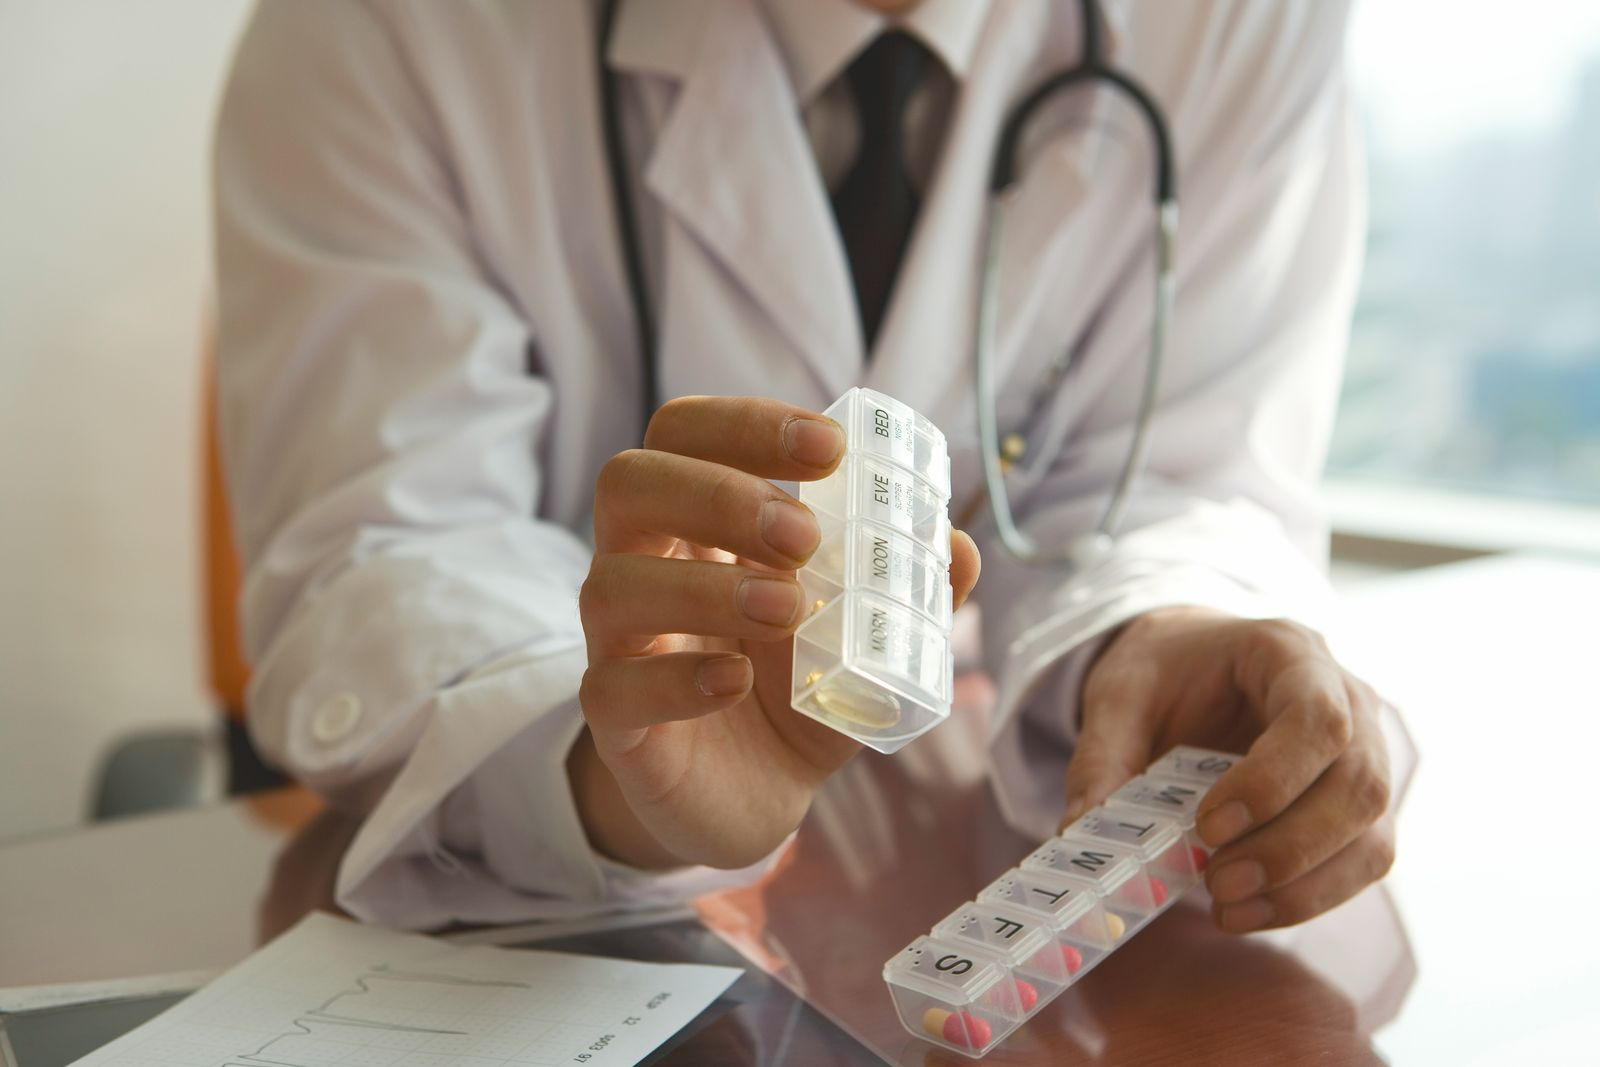 EINMALIGE VERWENDUNG Arzt/ Geld/ Pharmaindustrie